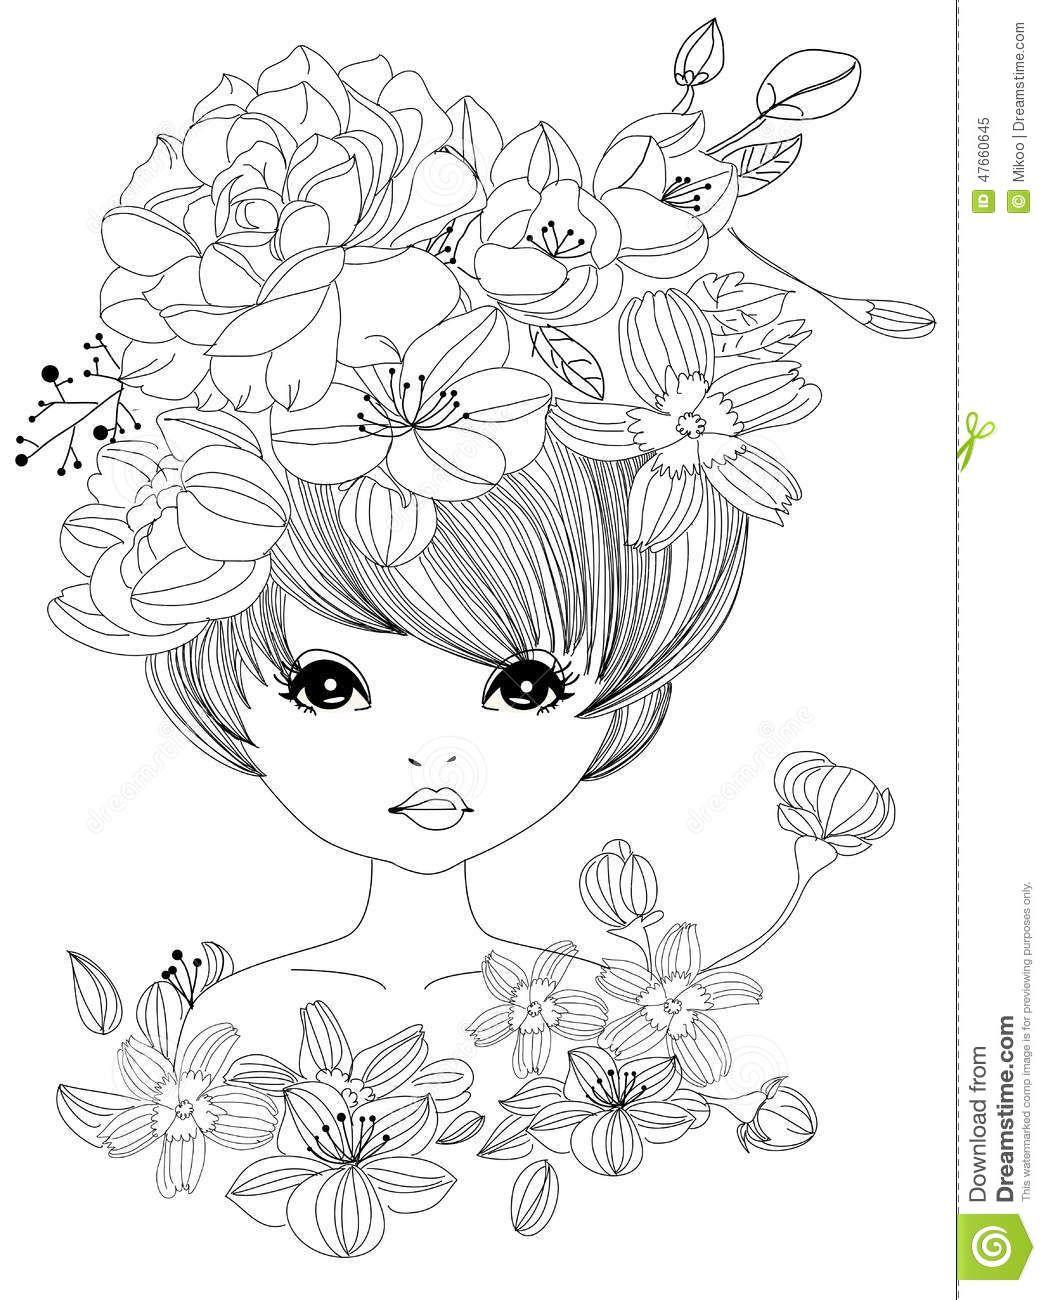 Pretty girl and flower | DIGI STAMPS | Pinterest | Colorear, Dibujo ...